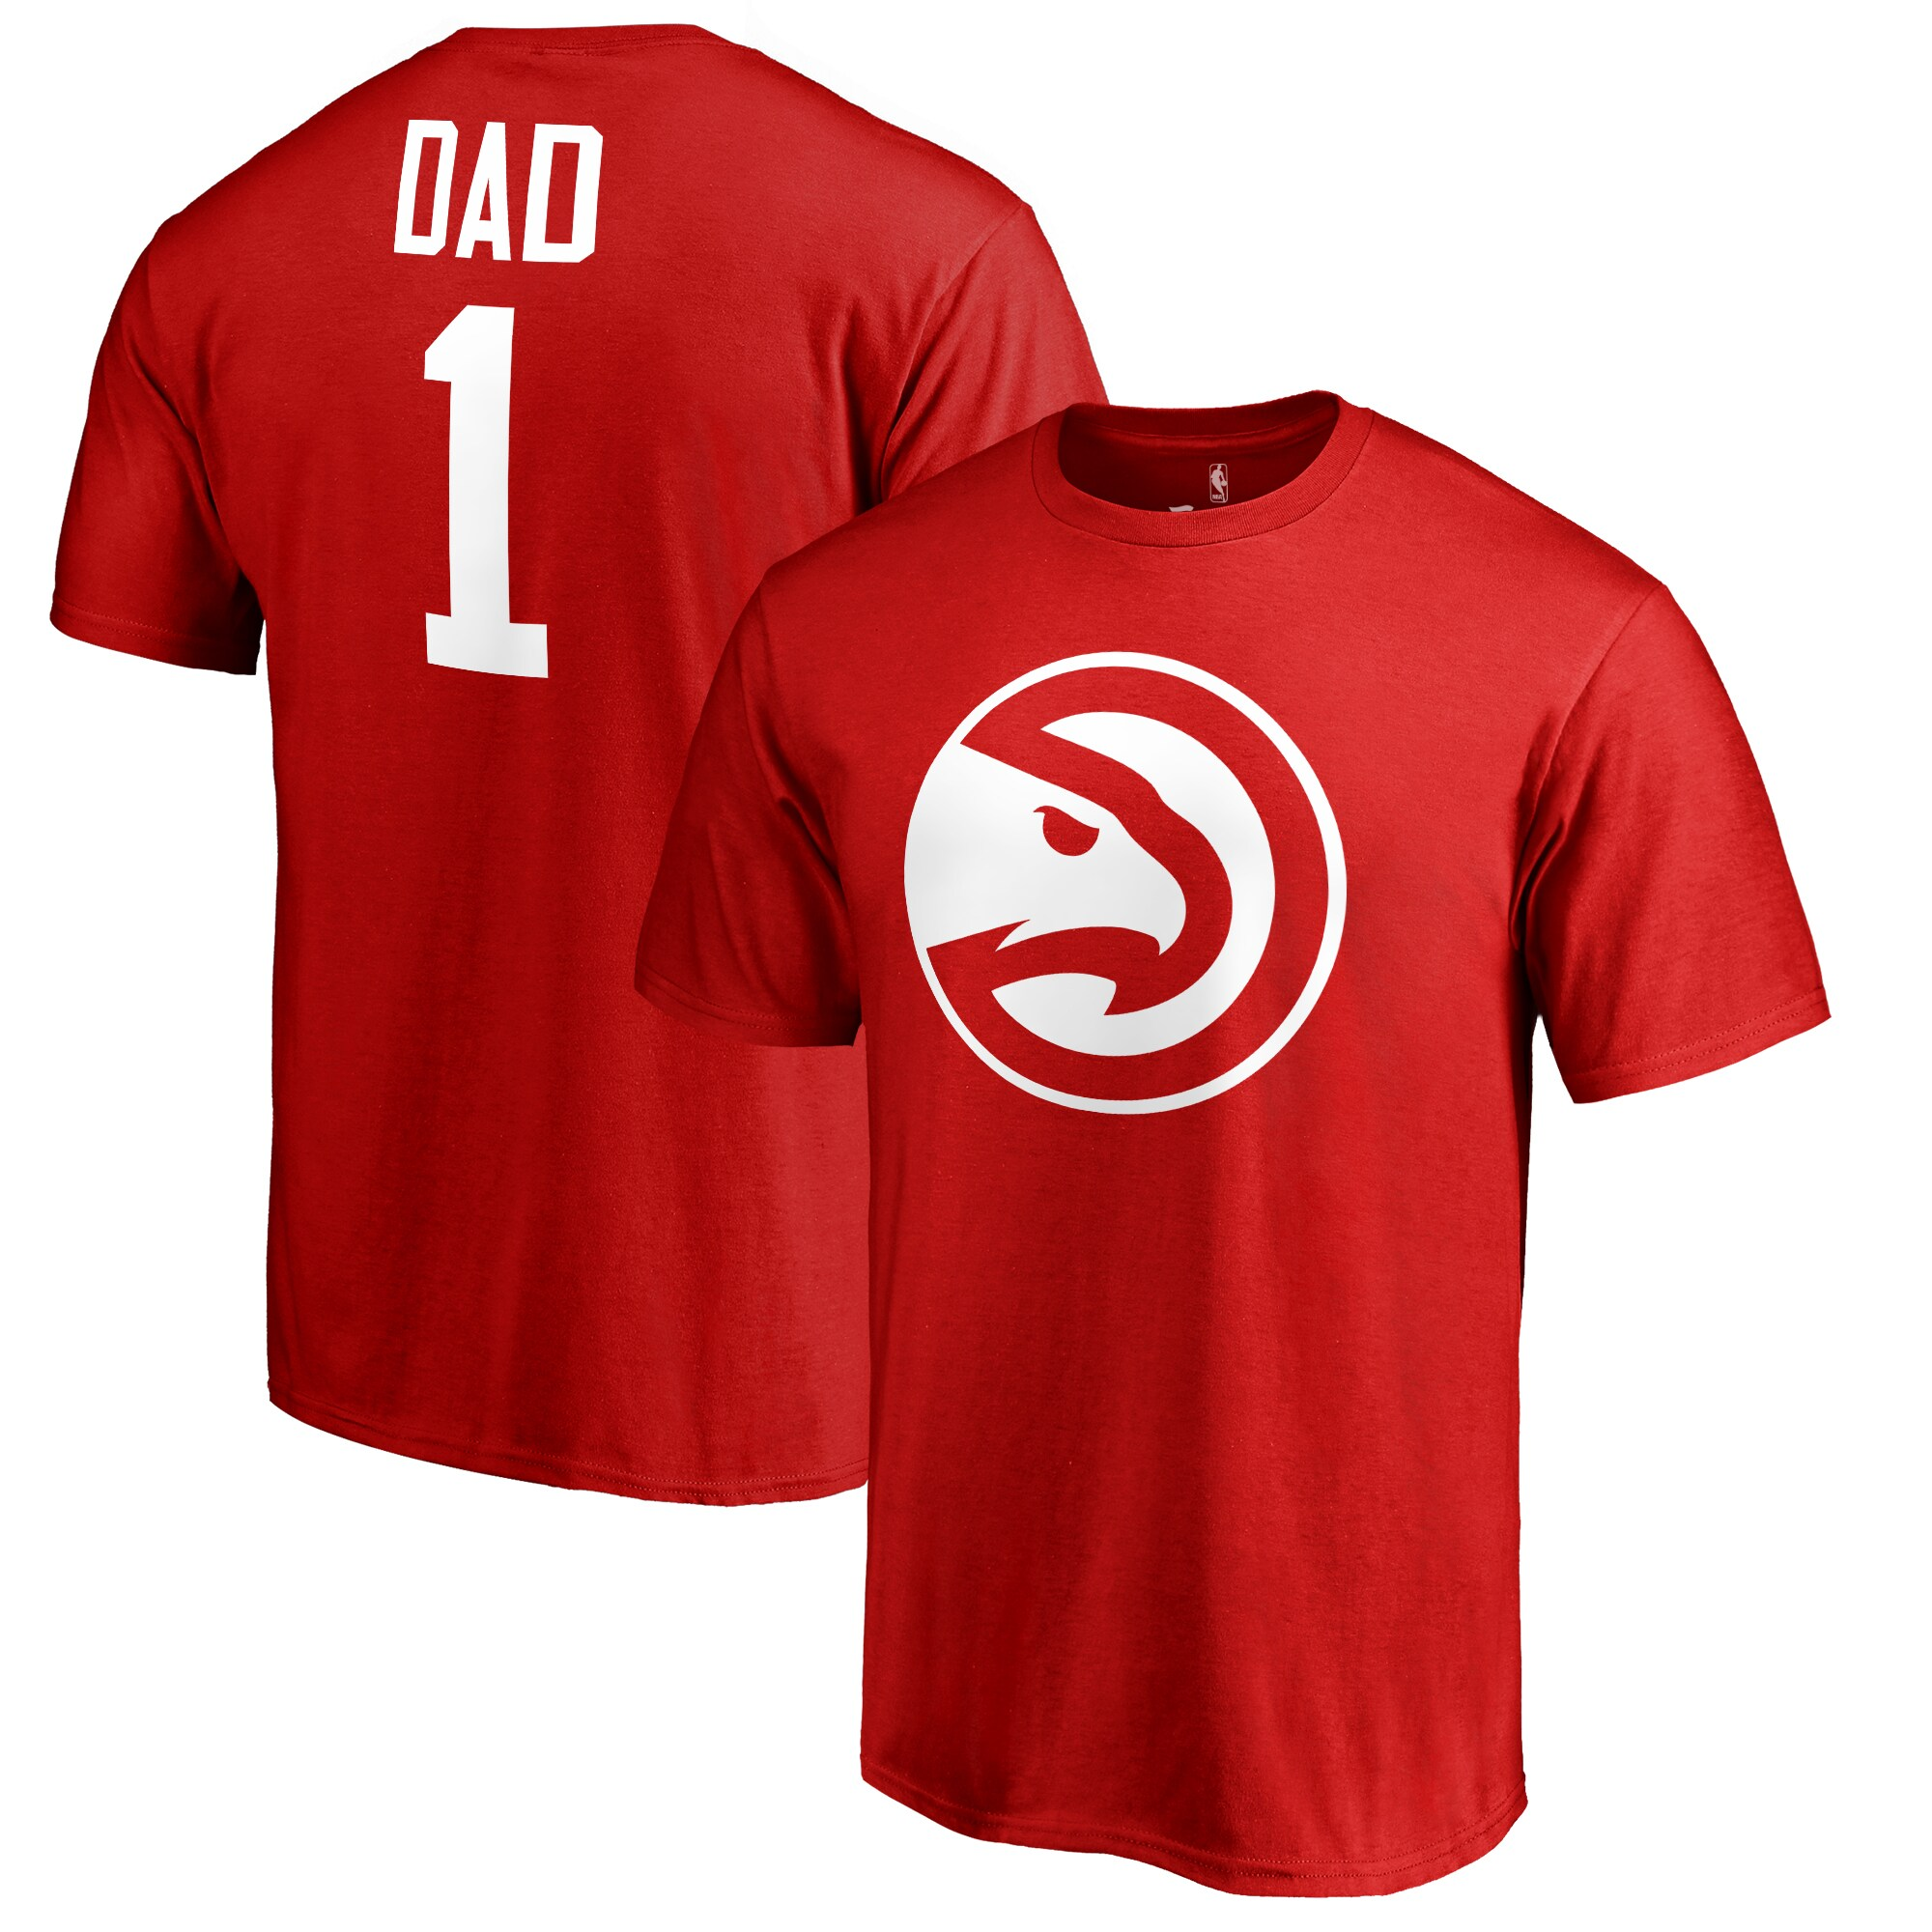 Atlanta Hawks #1 Dad T-Shirt - Red